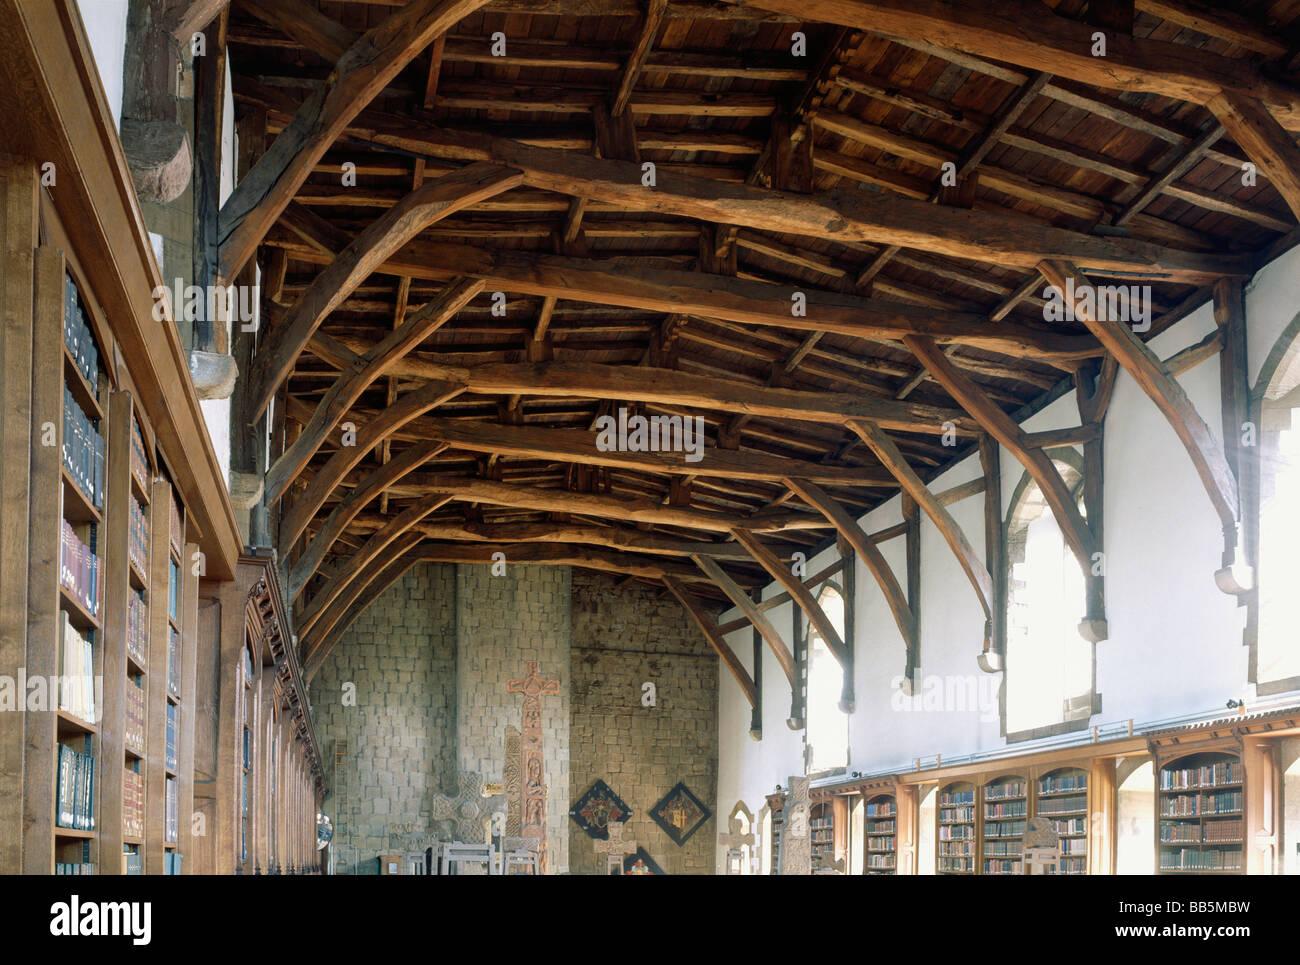 Timber Ceiling Stockfotos & Timber Ceiling Bilder - Alamy